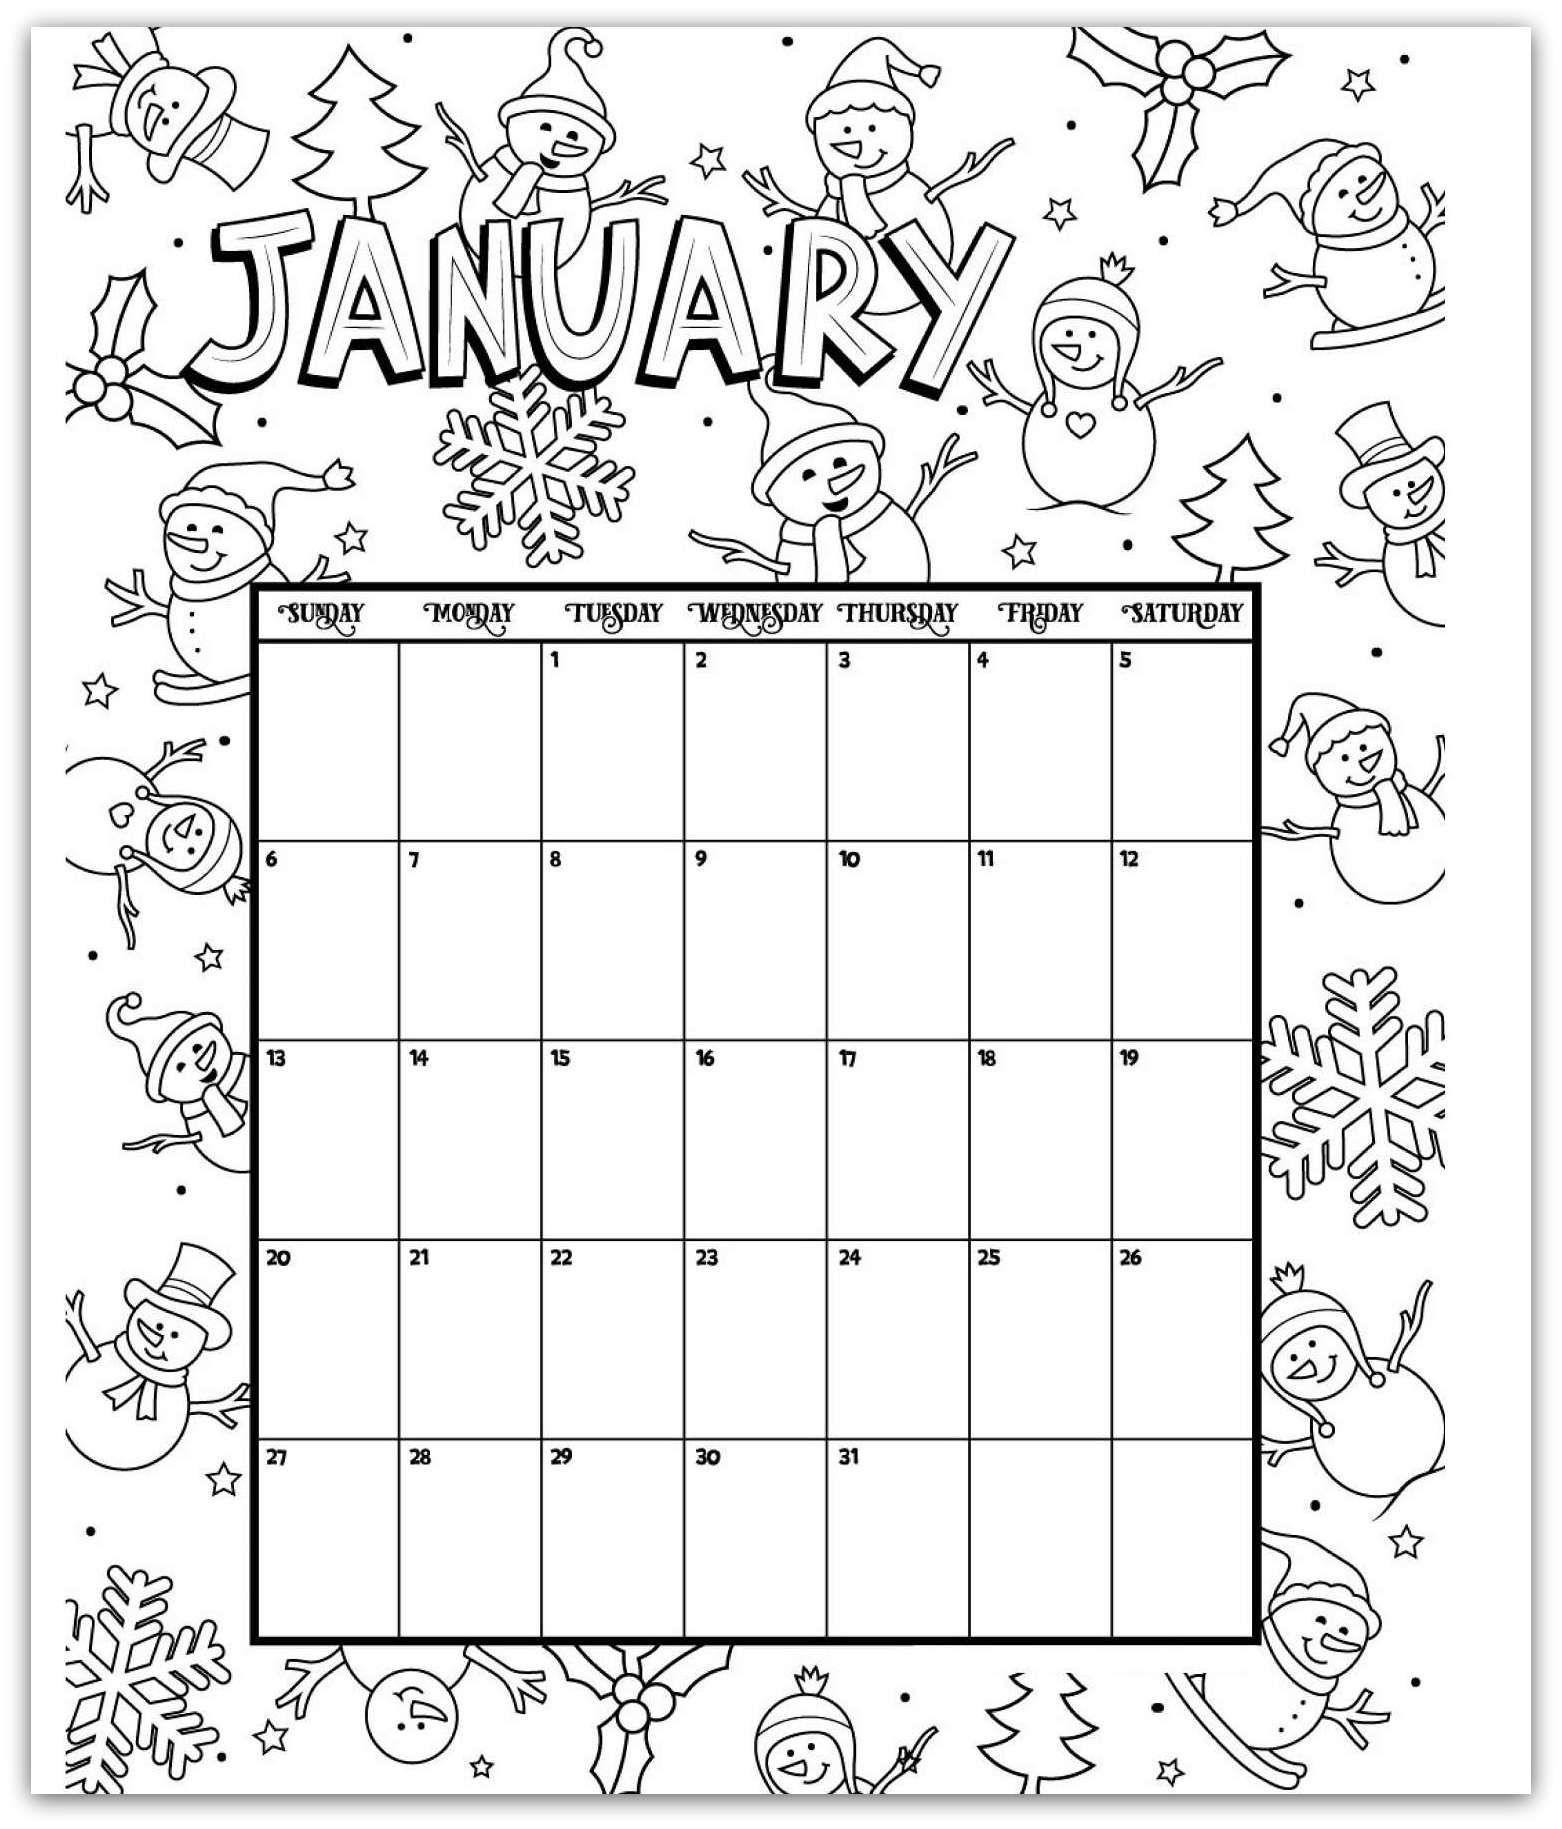 Free Printable January 2019 Calendar With Behavior Color For Kindergarten january 2019 coloring page printable calendar | Creative | Kids